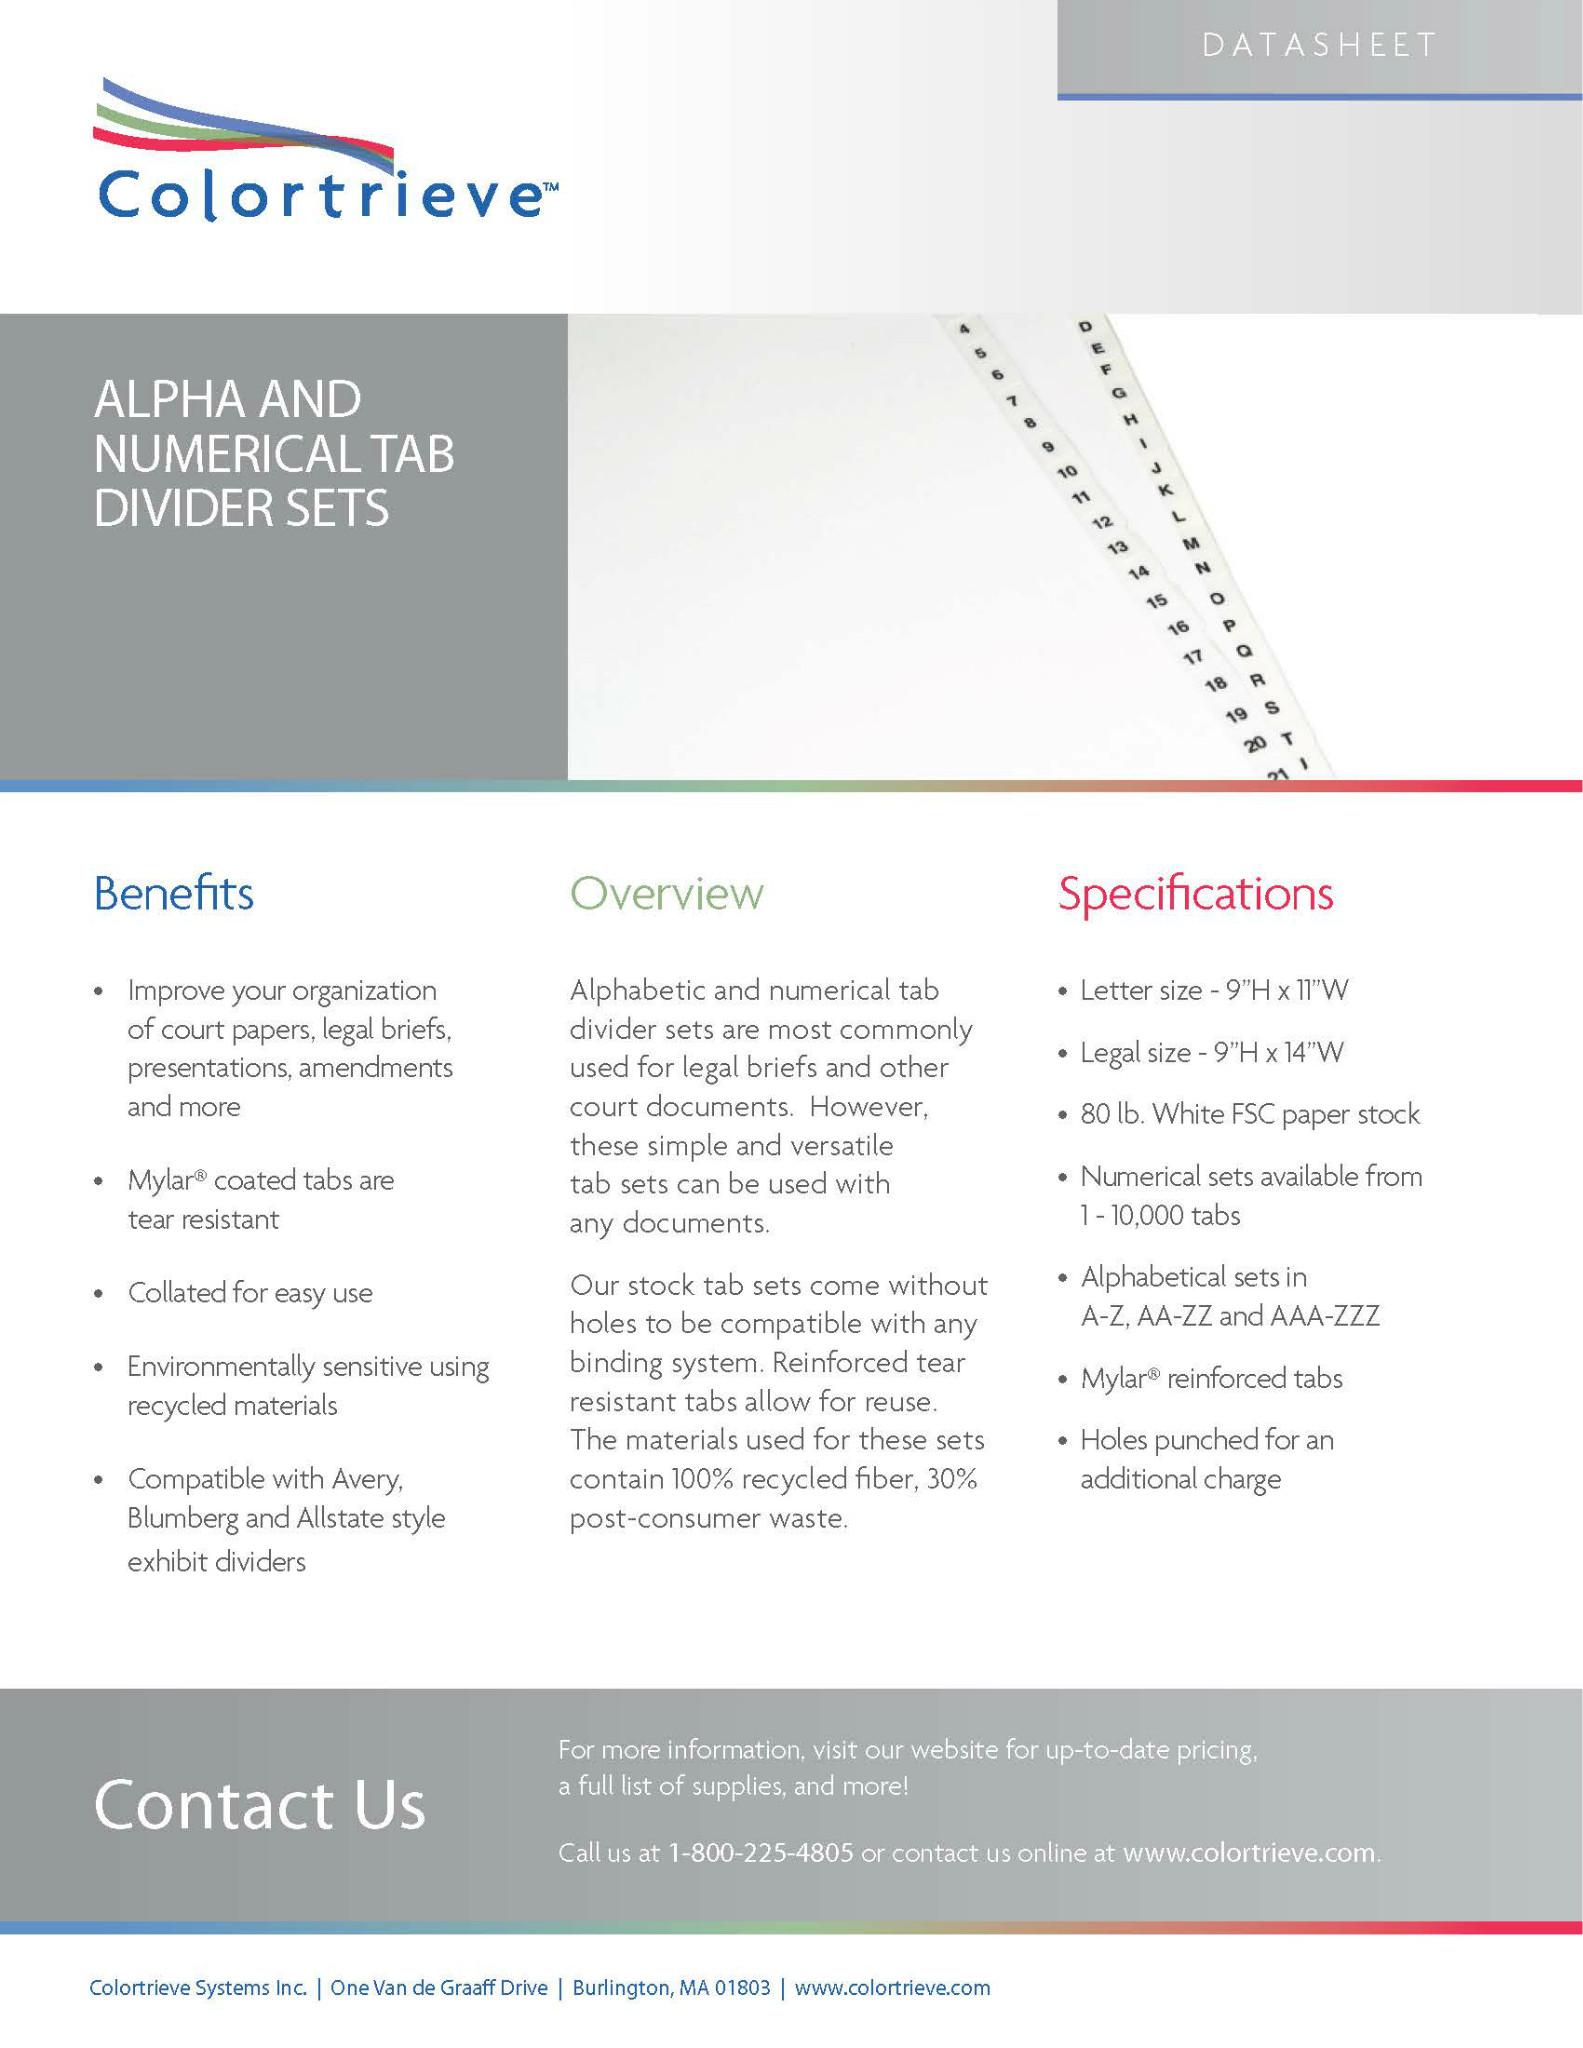 Photo: Alpha/Numerical Tab Divider Sets